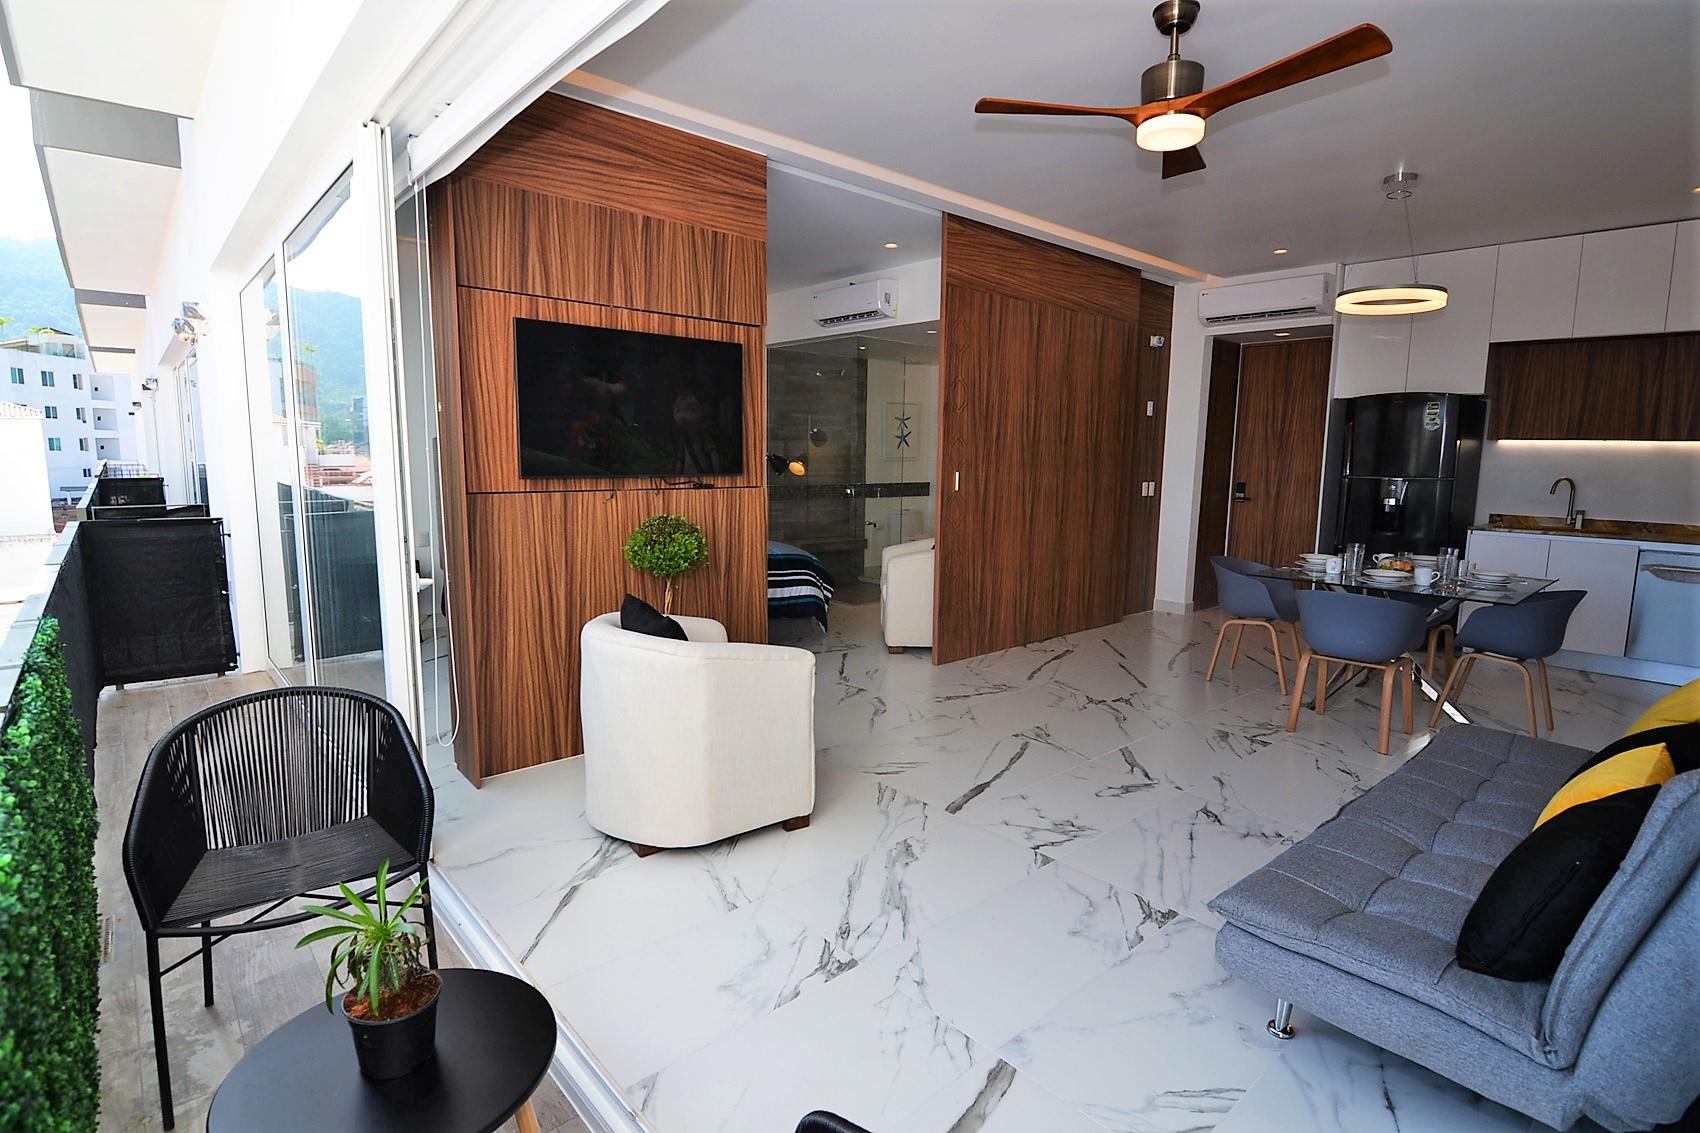 Condo Avida Super Studio 4 - Puerto Vallarta Furnished Condo Romantic Zone (52)